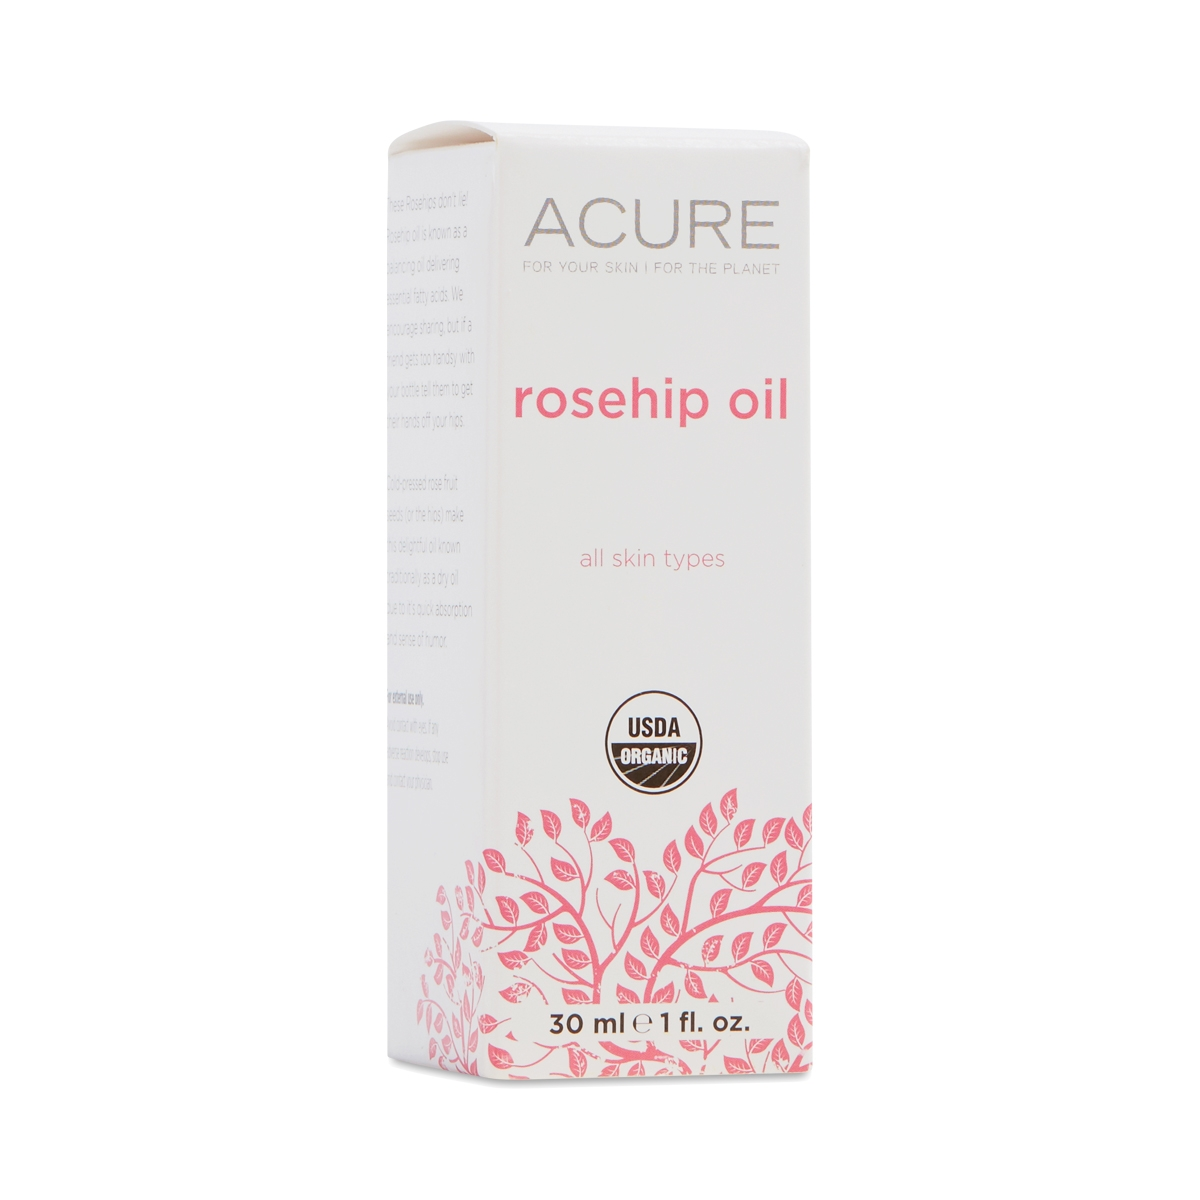 Acure 1850007 1 fl oz Organics Rosehip Oil